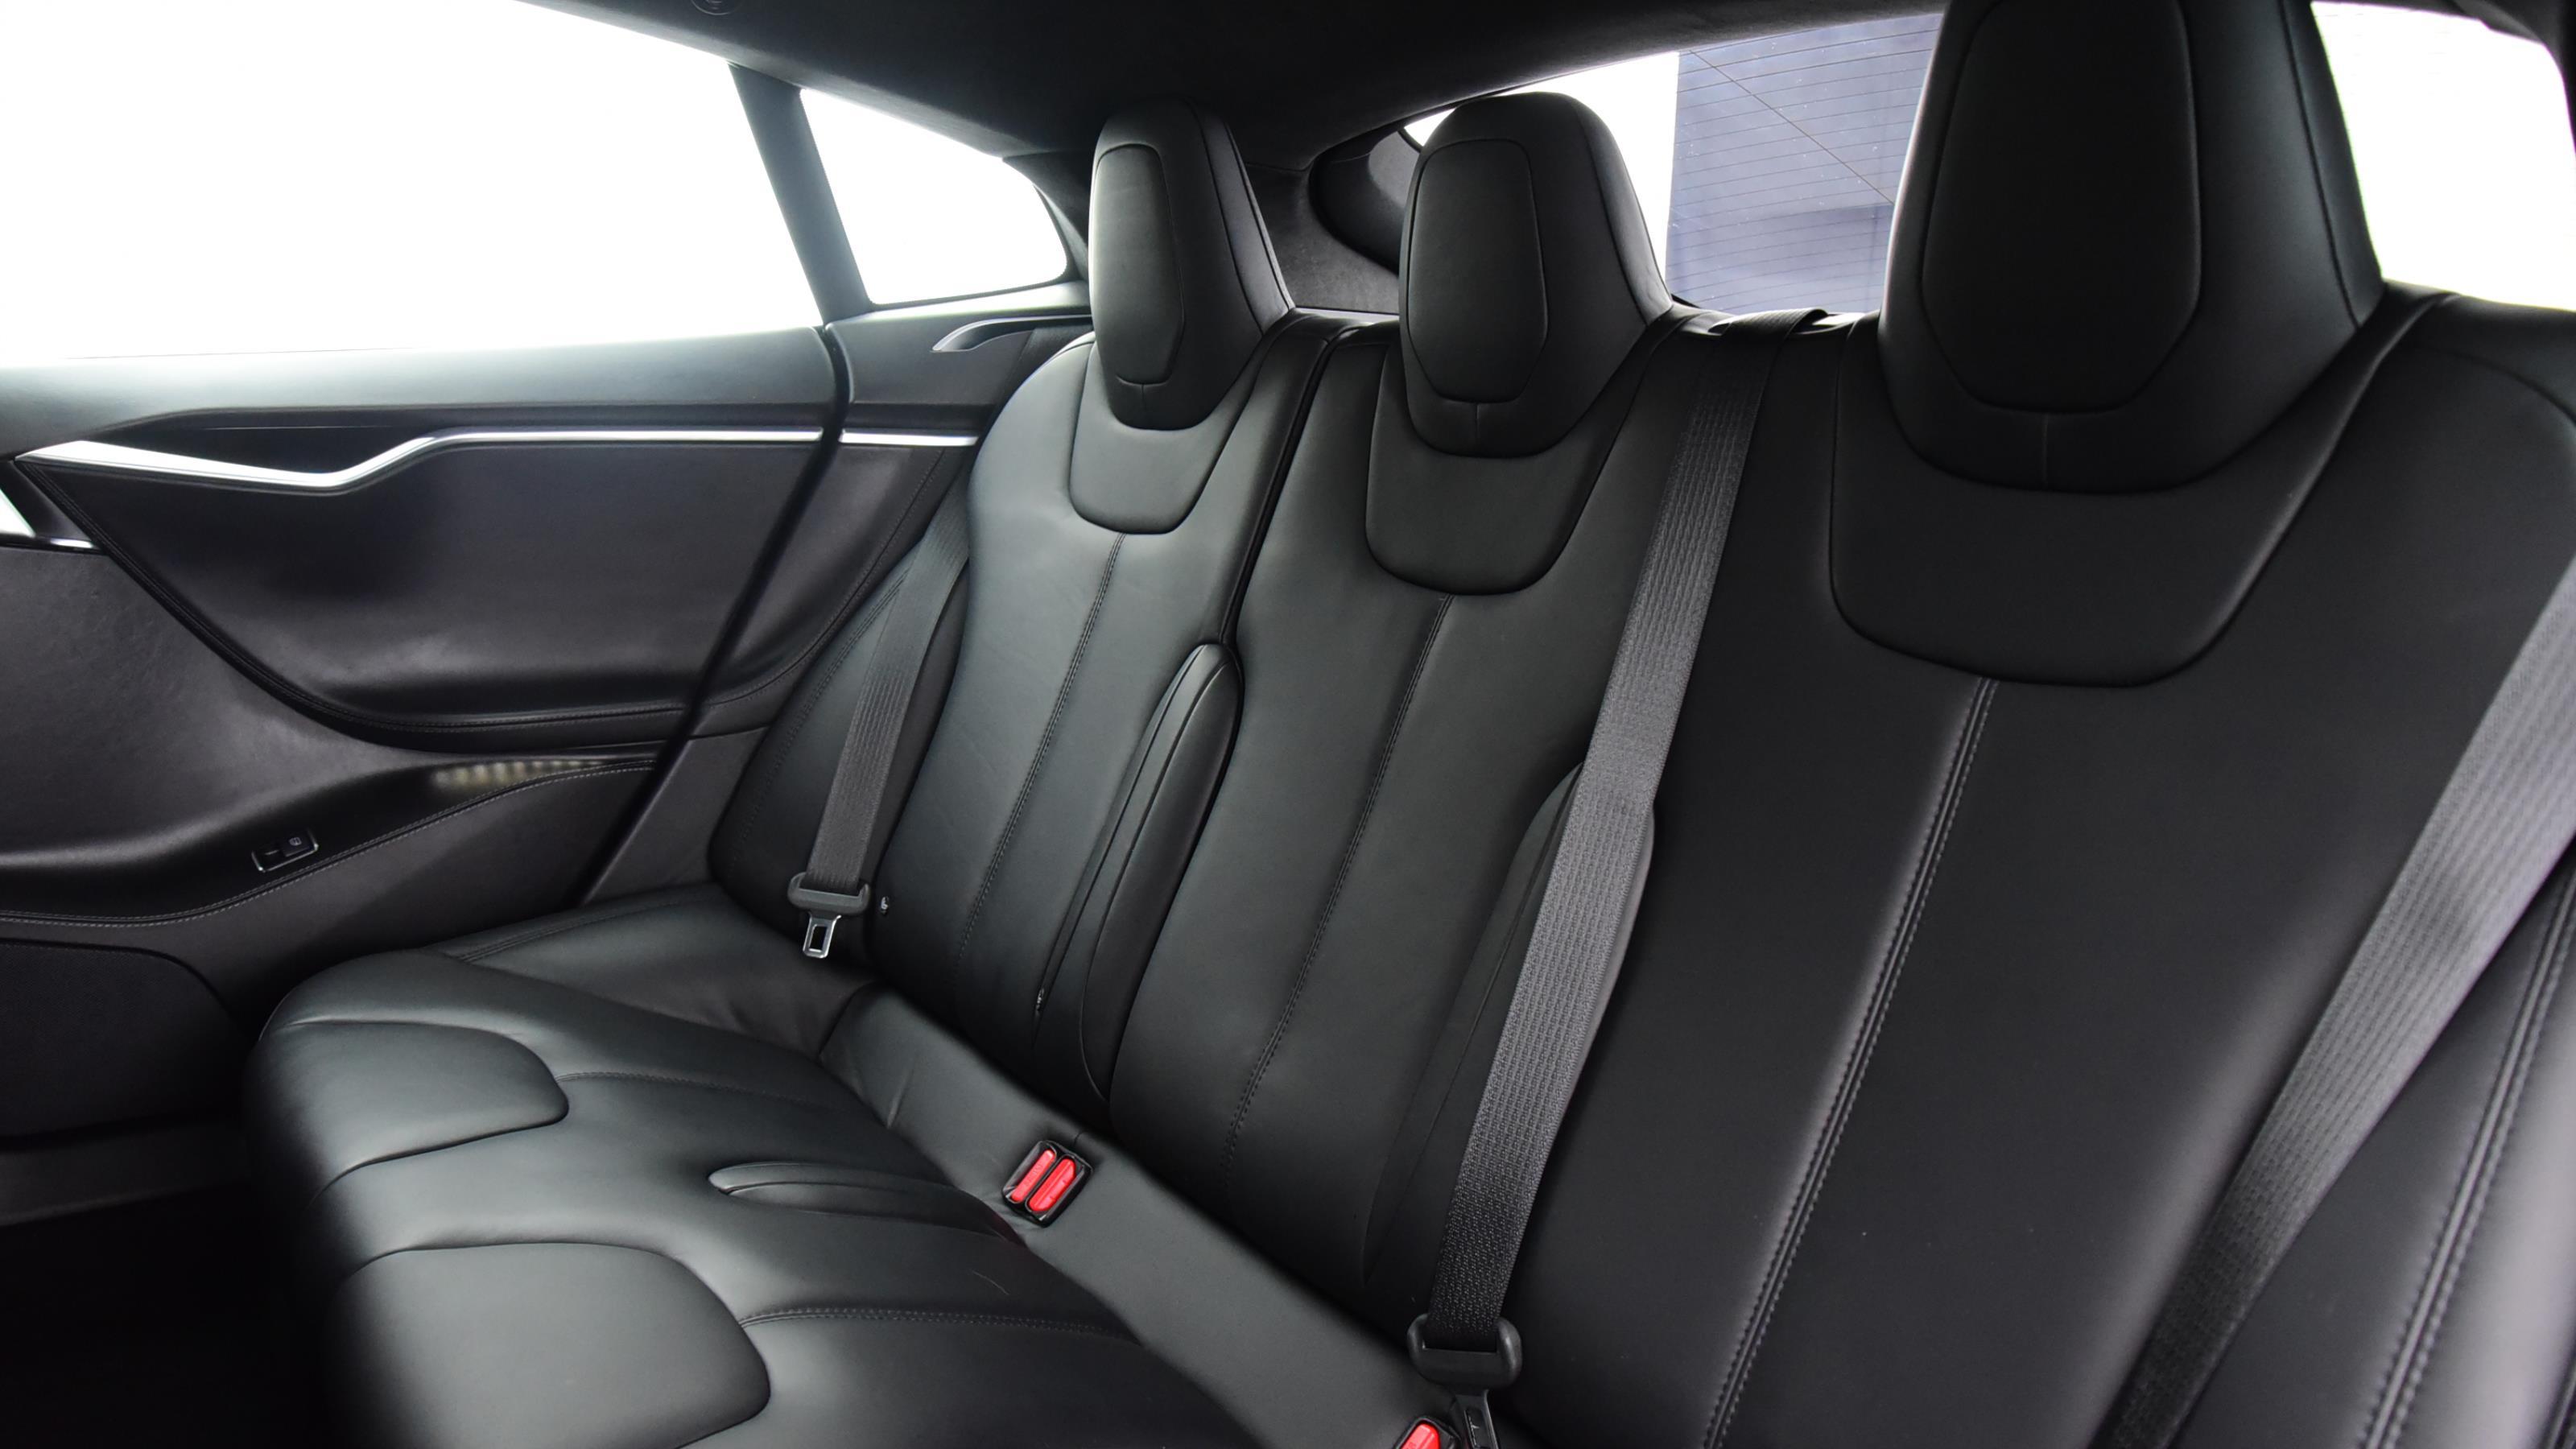 Used 2018 Tesla MODEL S 315kW 90kWh Dual Motor 5dr [Nav] BLACK at Saxton4x4